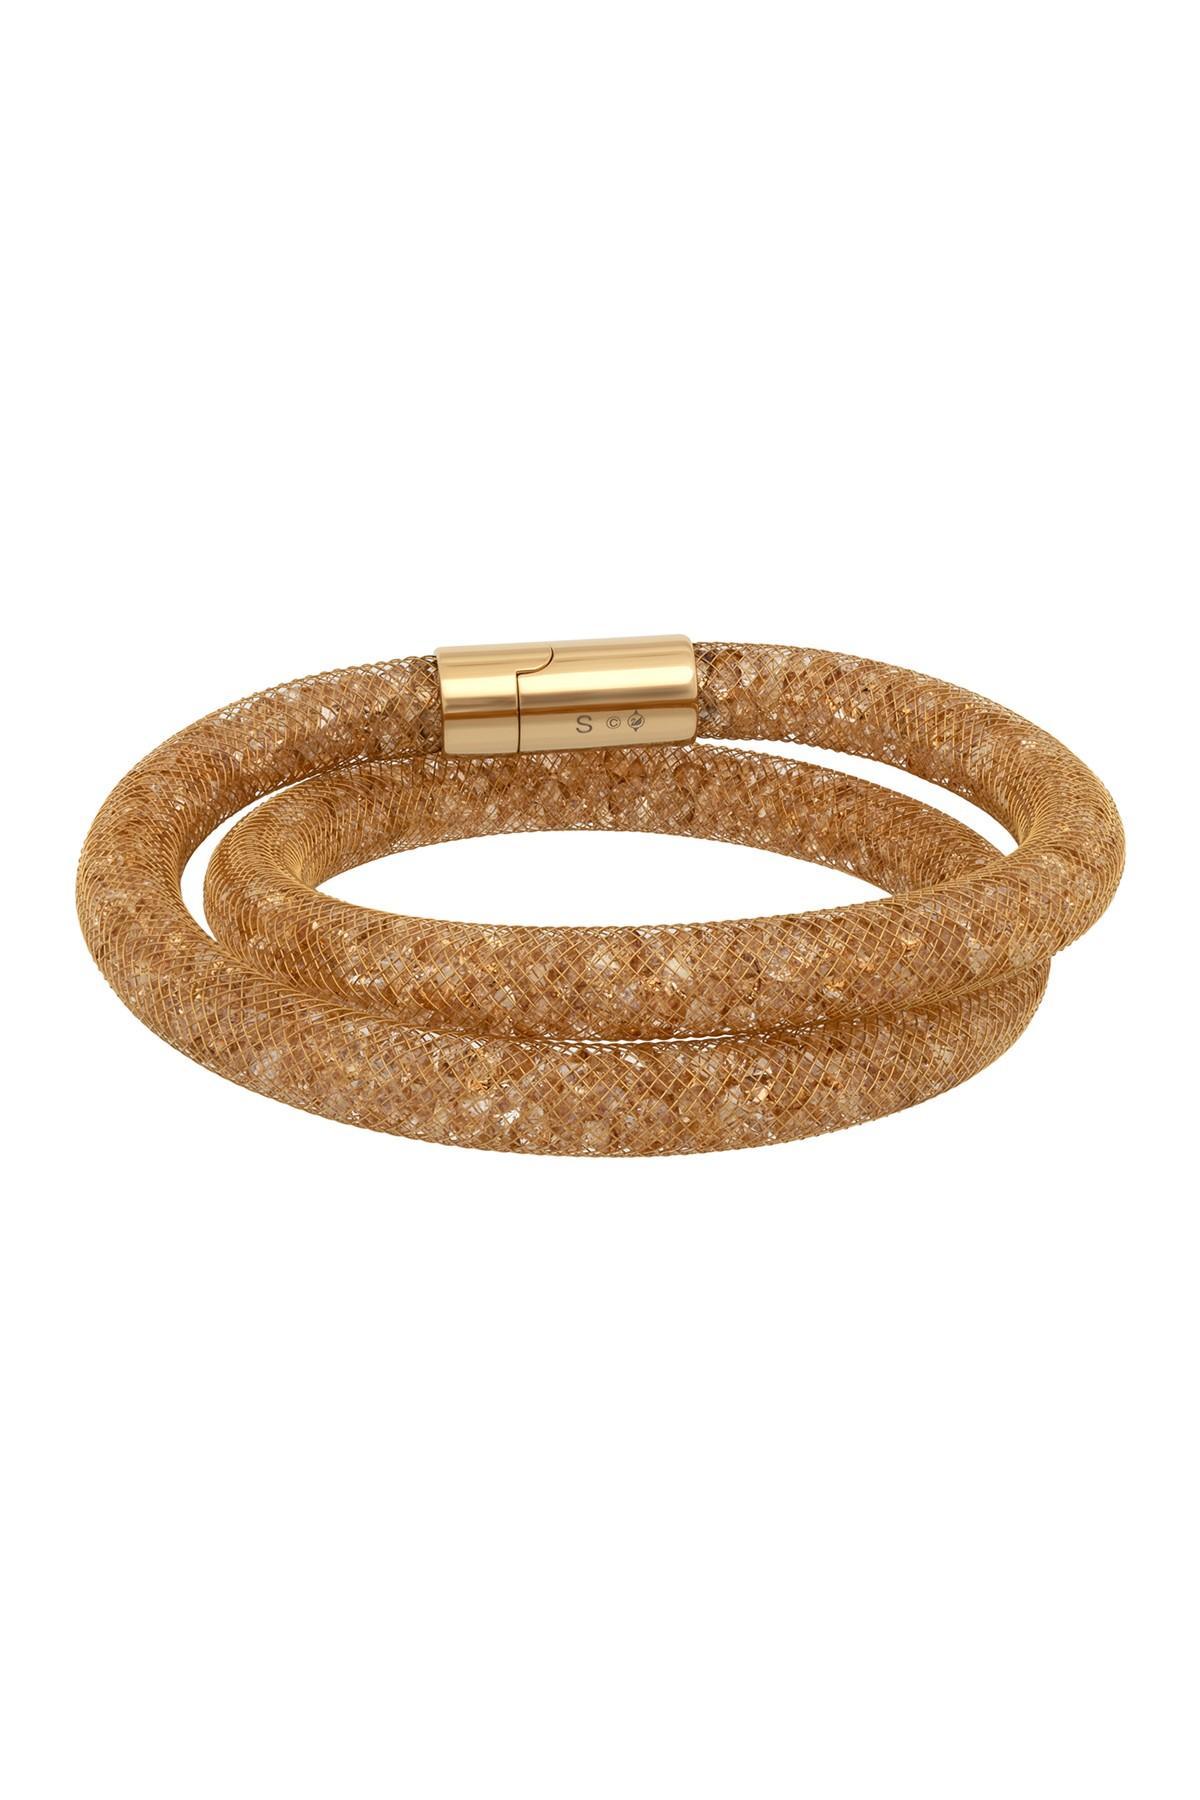 Stardust Crystal Filled Mesh Deluxe Bracelet